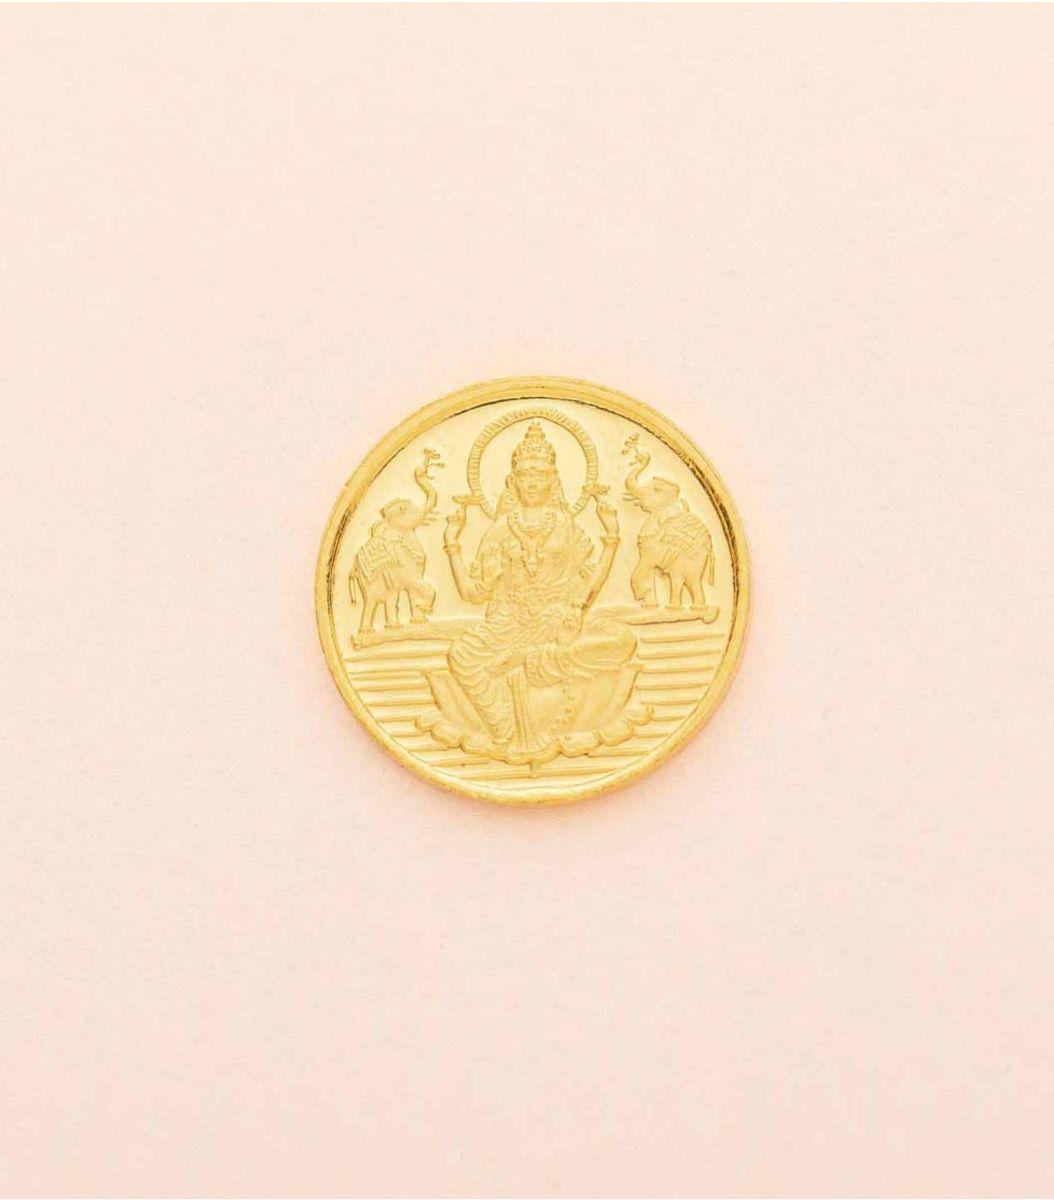 Gold Laxmi Coin-5GM